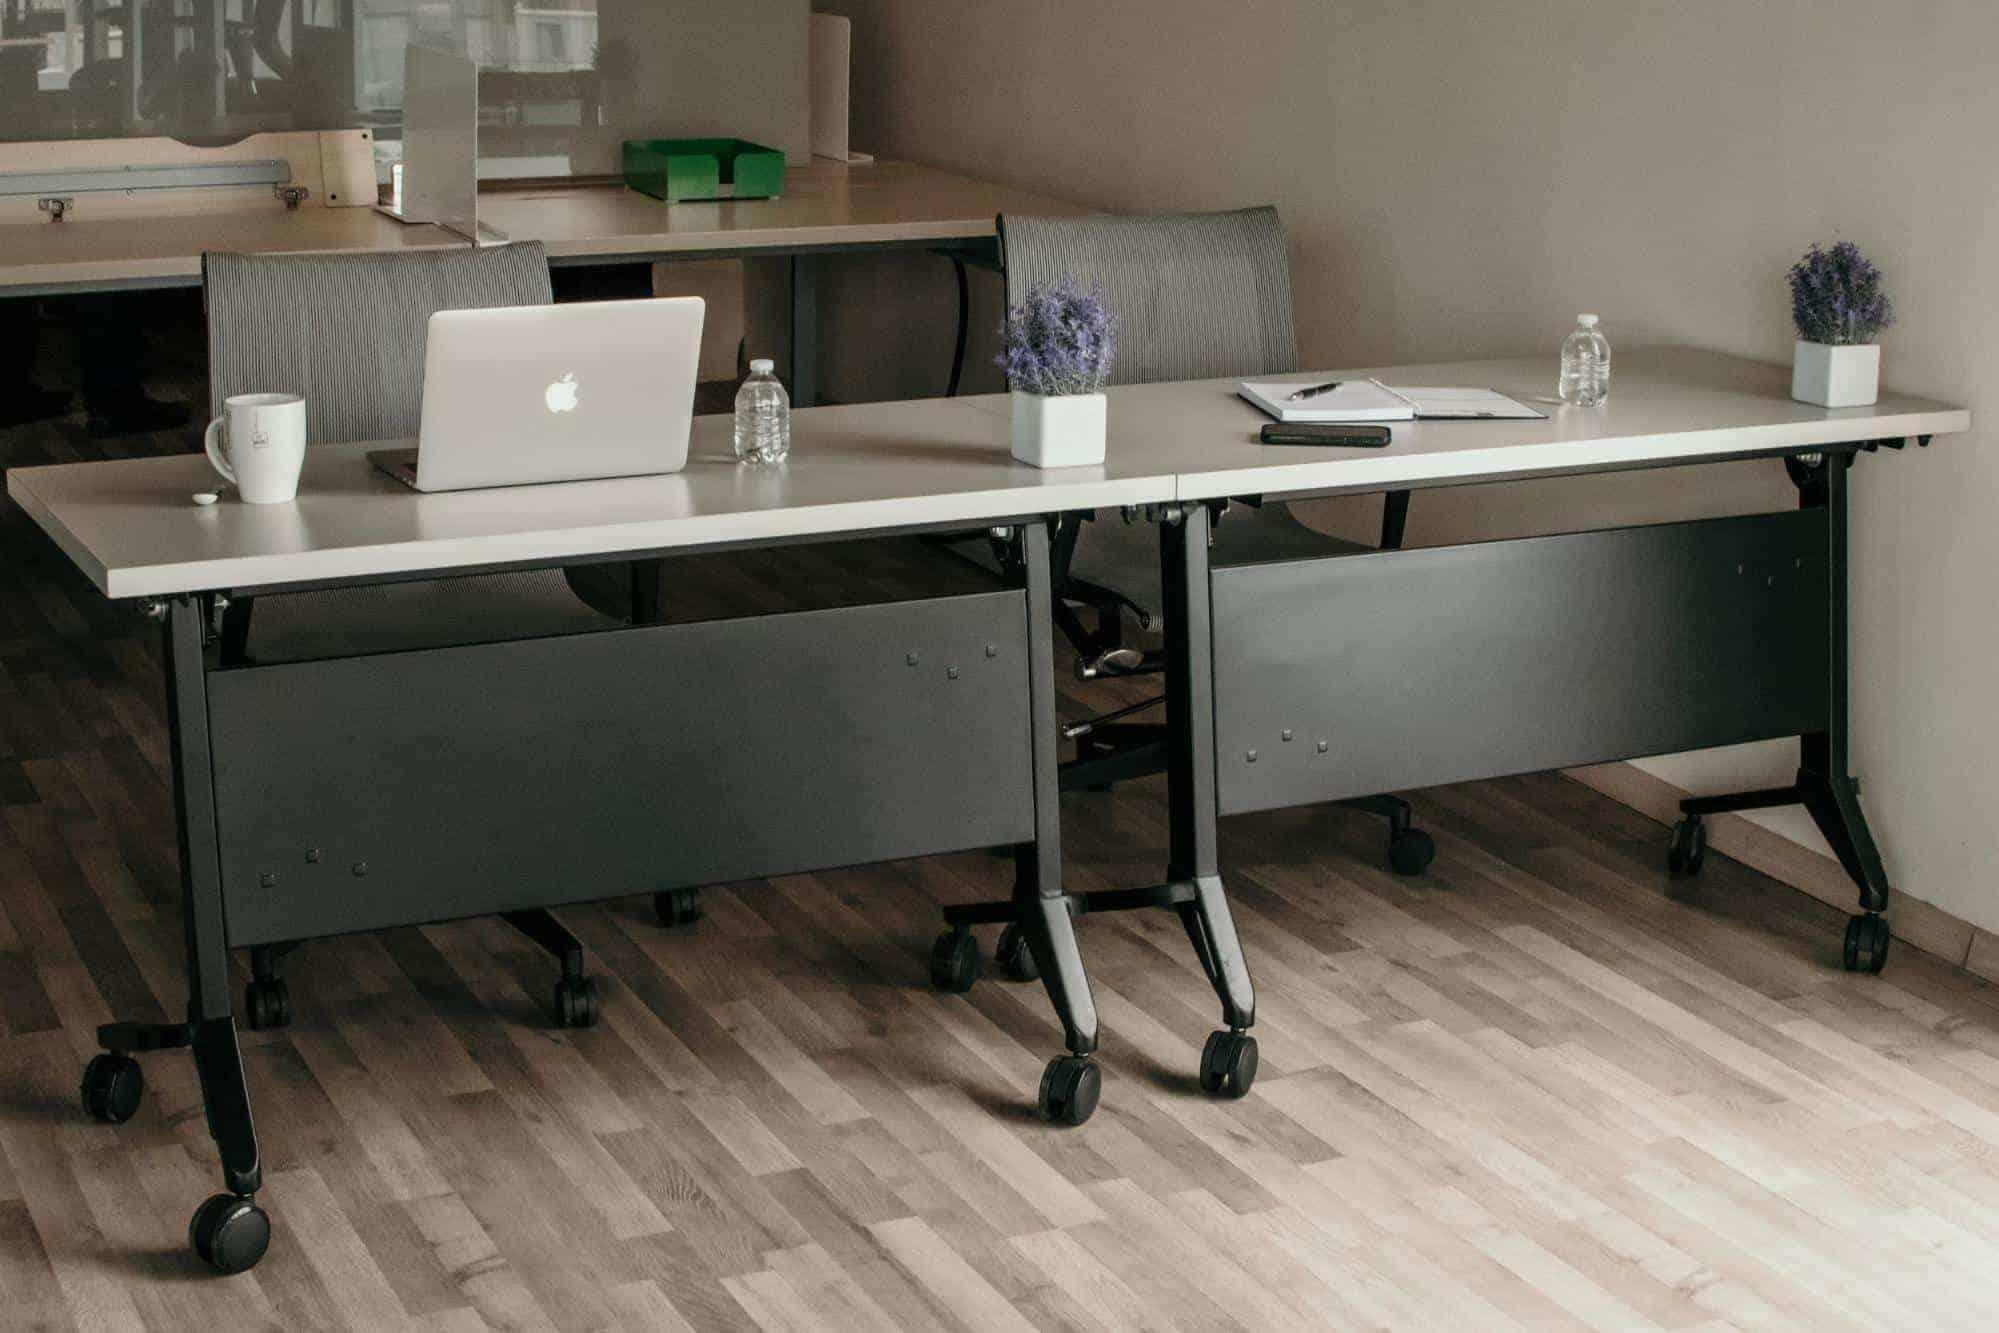 8-caracteristicas-de-una-oficina-moderna